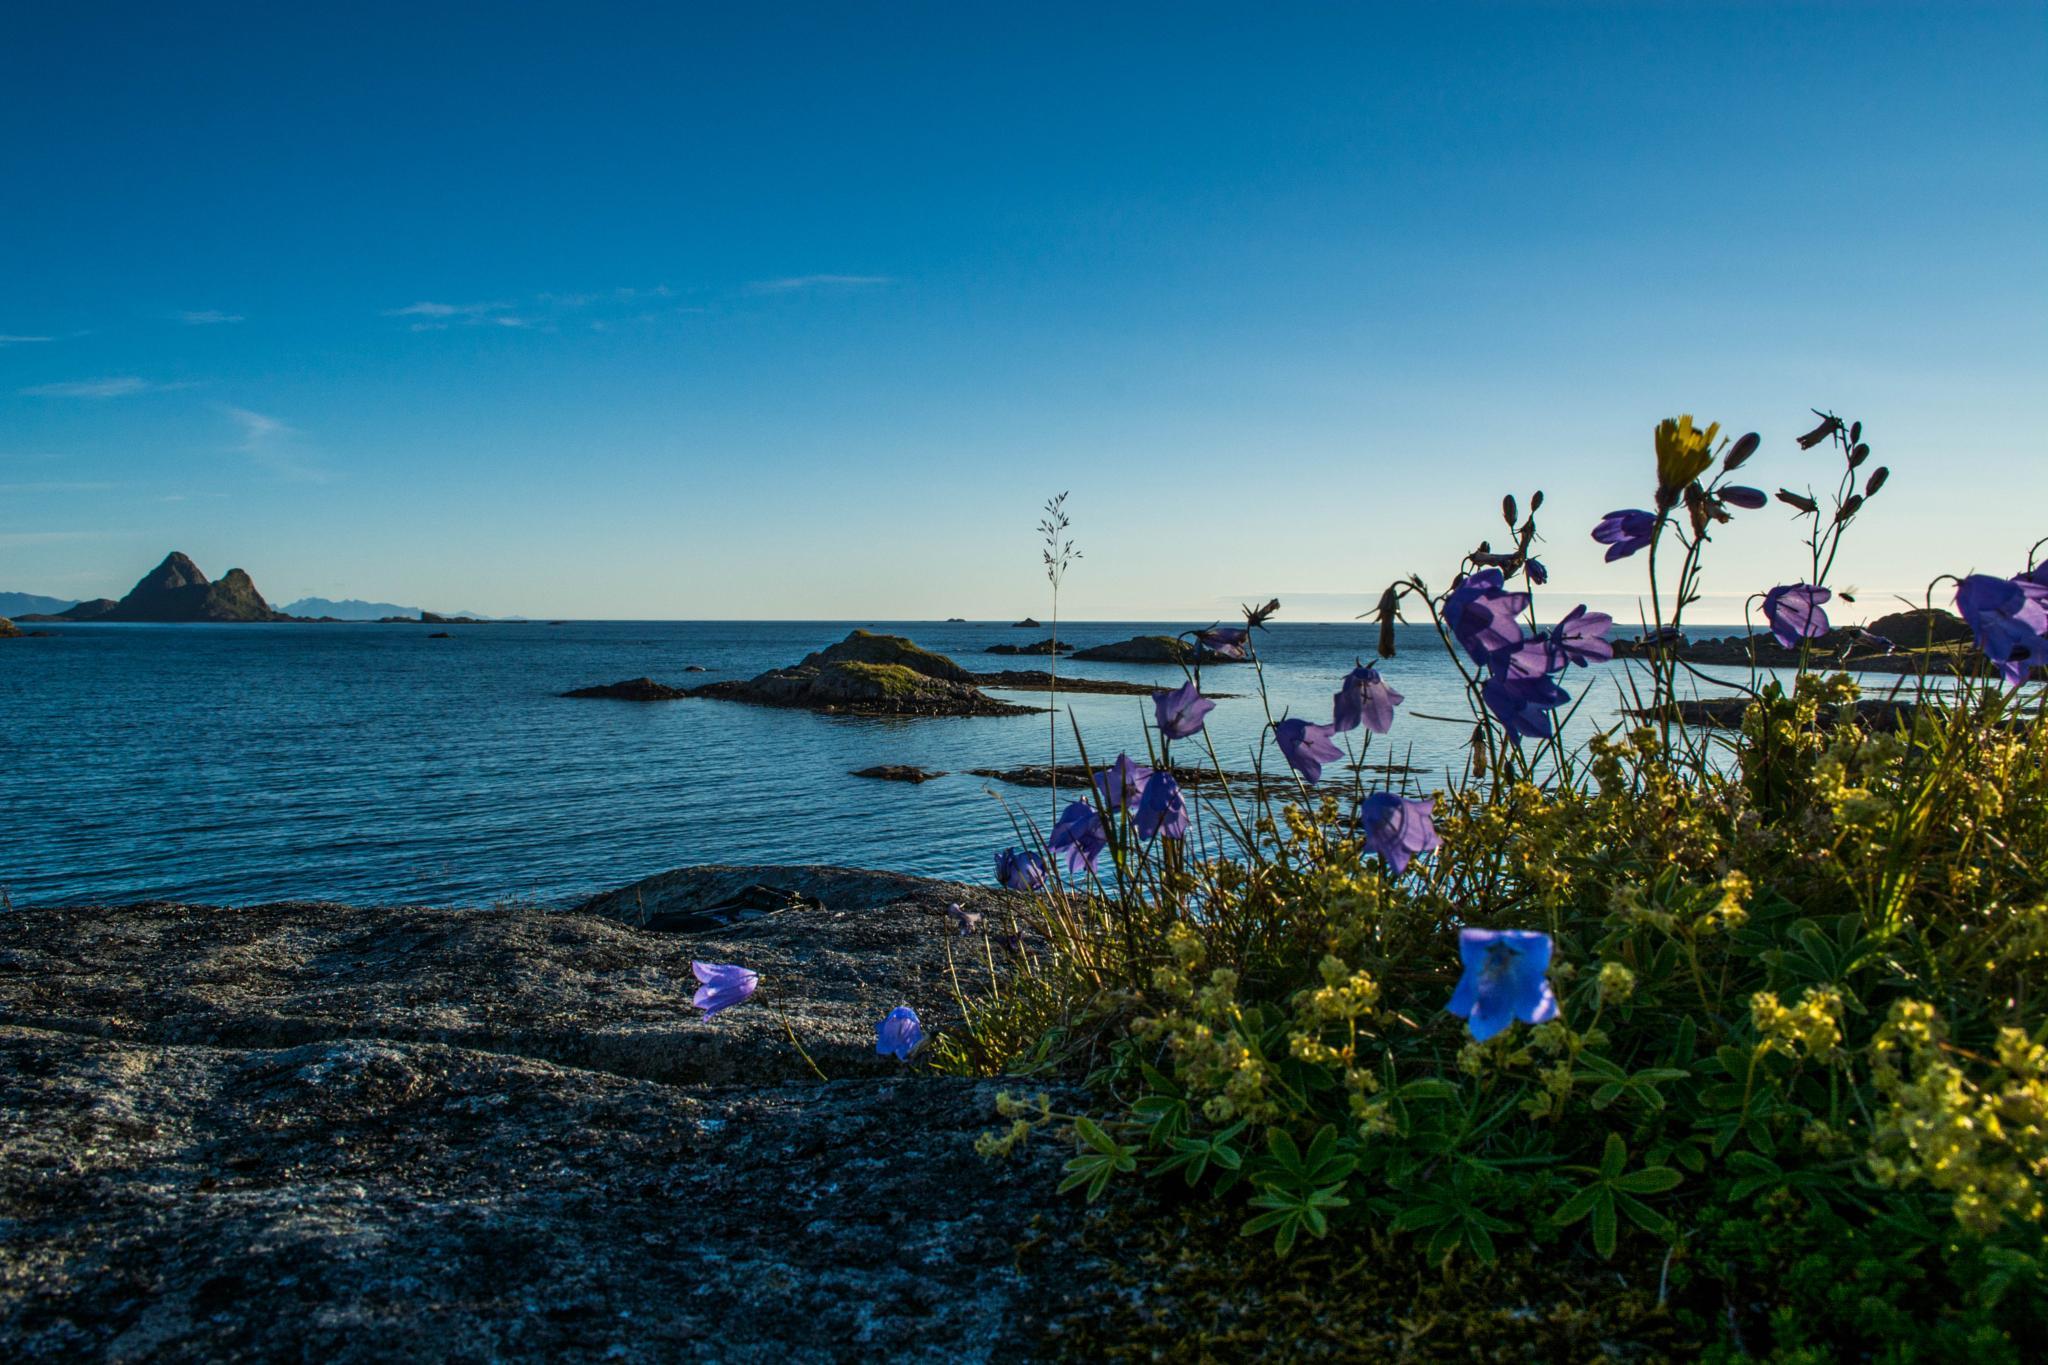 Flower power  by line.kristiansen3